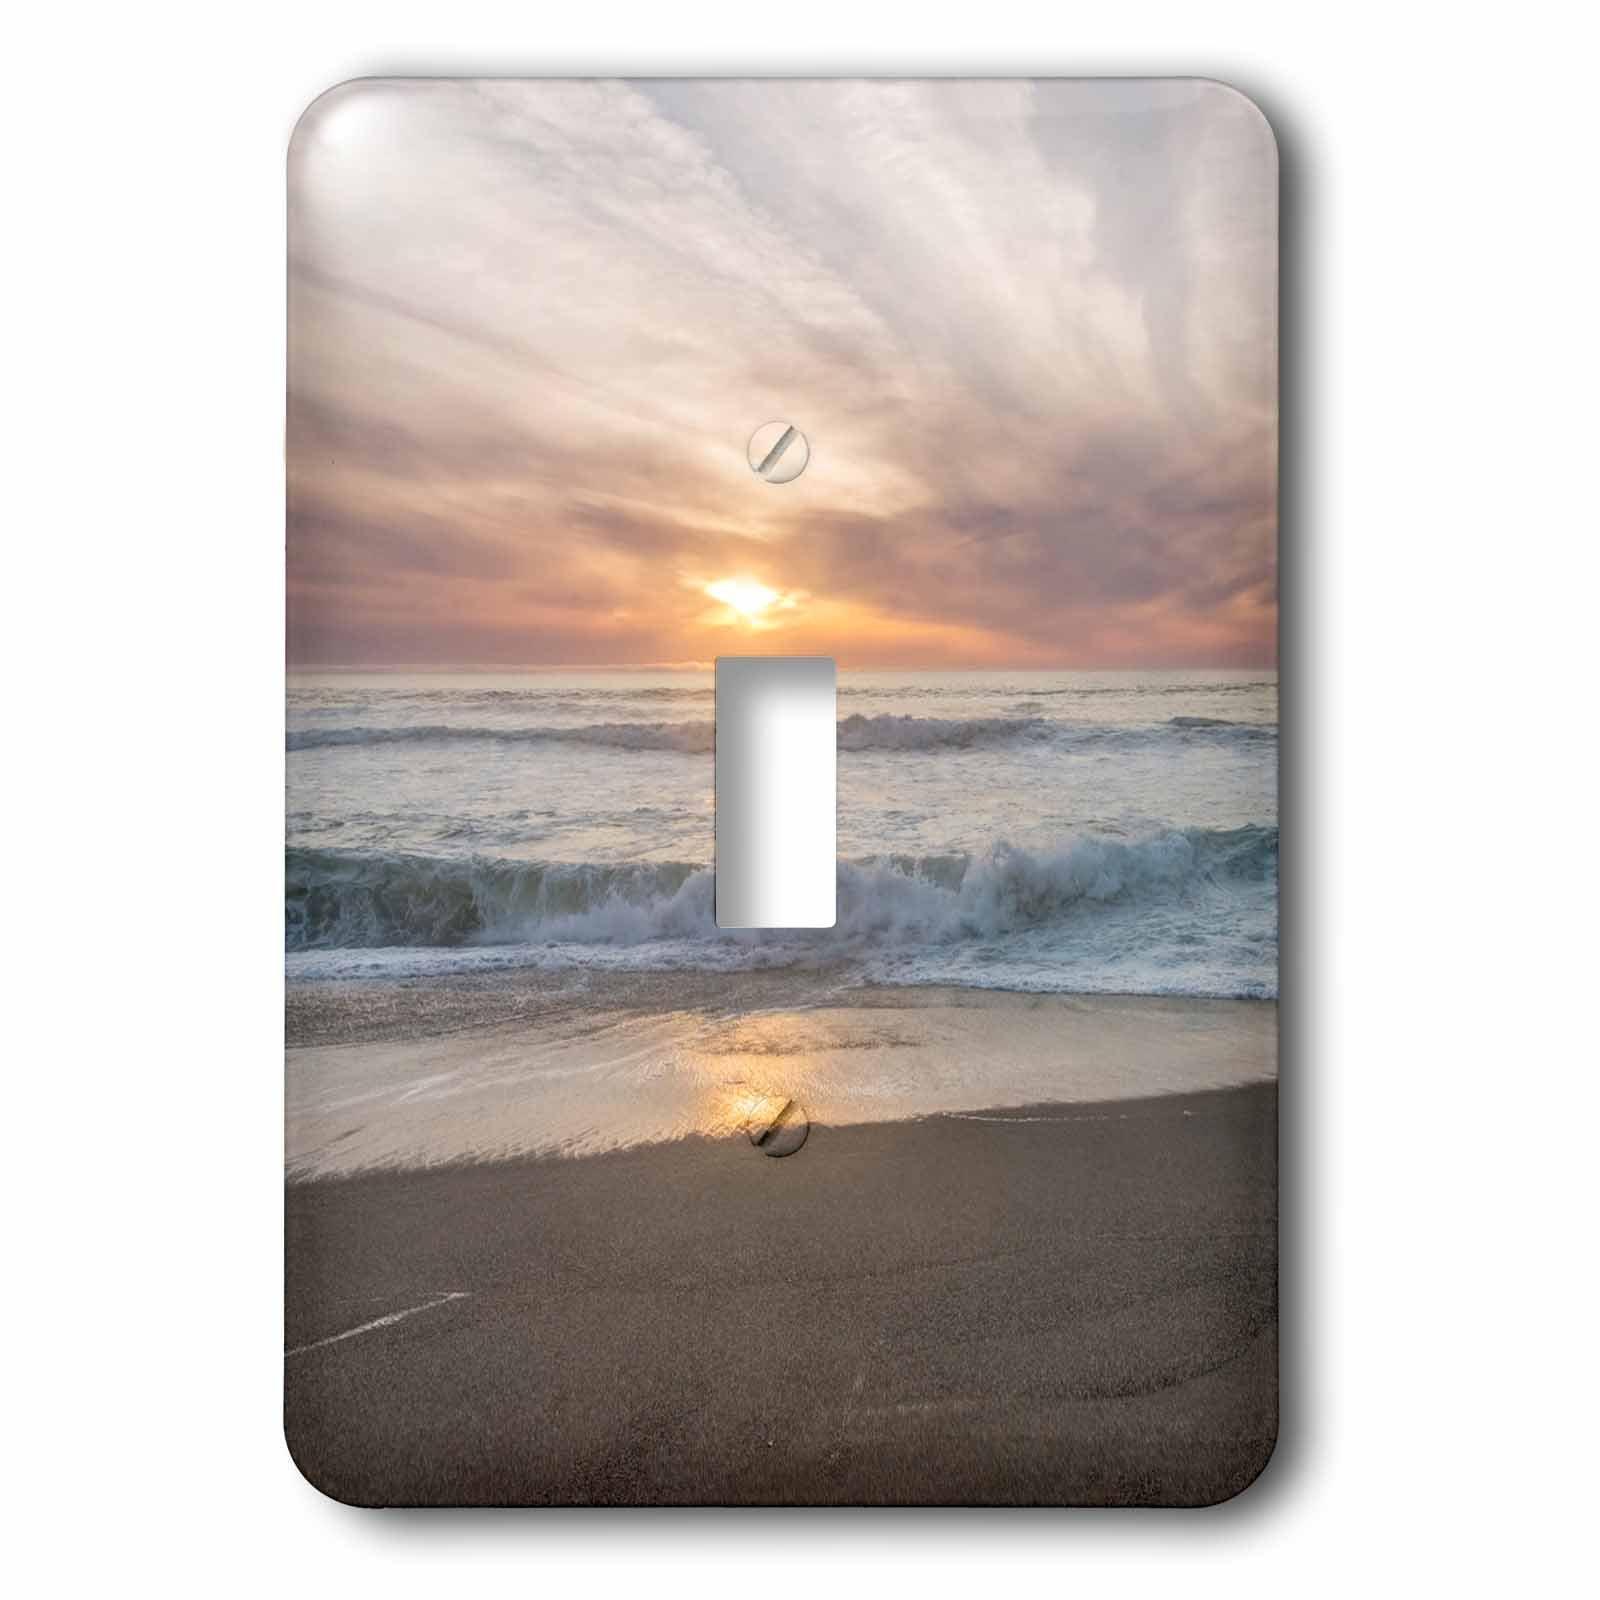 3dRose LSP_278660_1 USA, California, Seashore, Point Reyes Beach Sunset Toggle Switch, Mixed